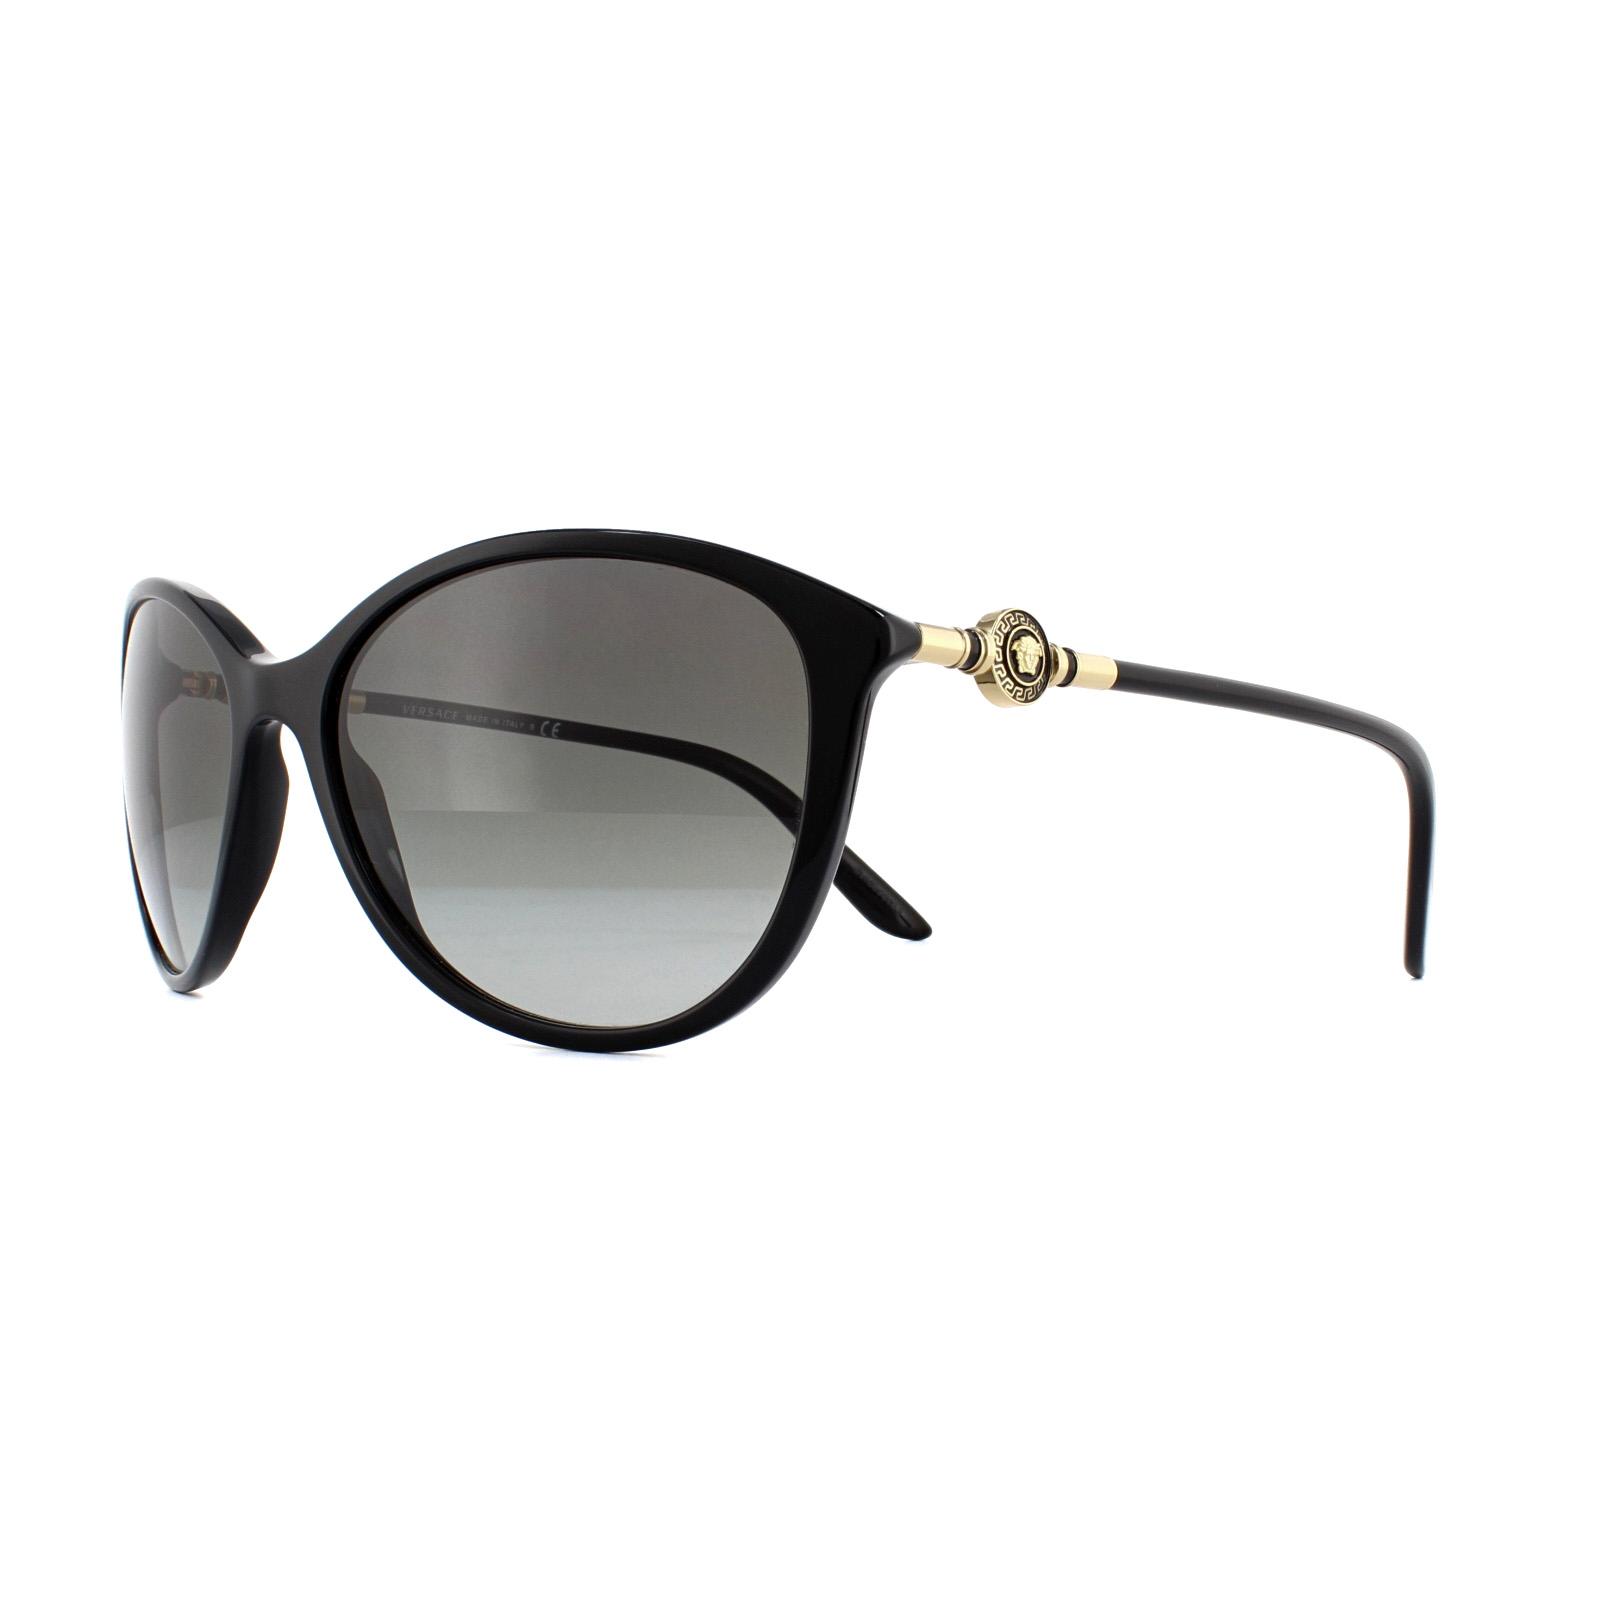 41dd843234 Sentinel Versace Sunglasses 4251 GB1/11 Black Grey Gradient